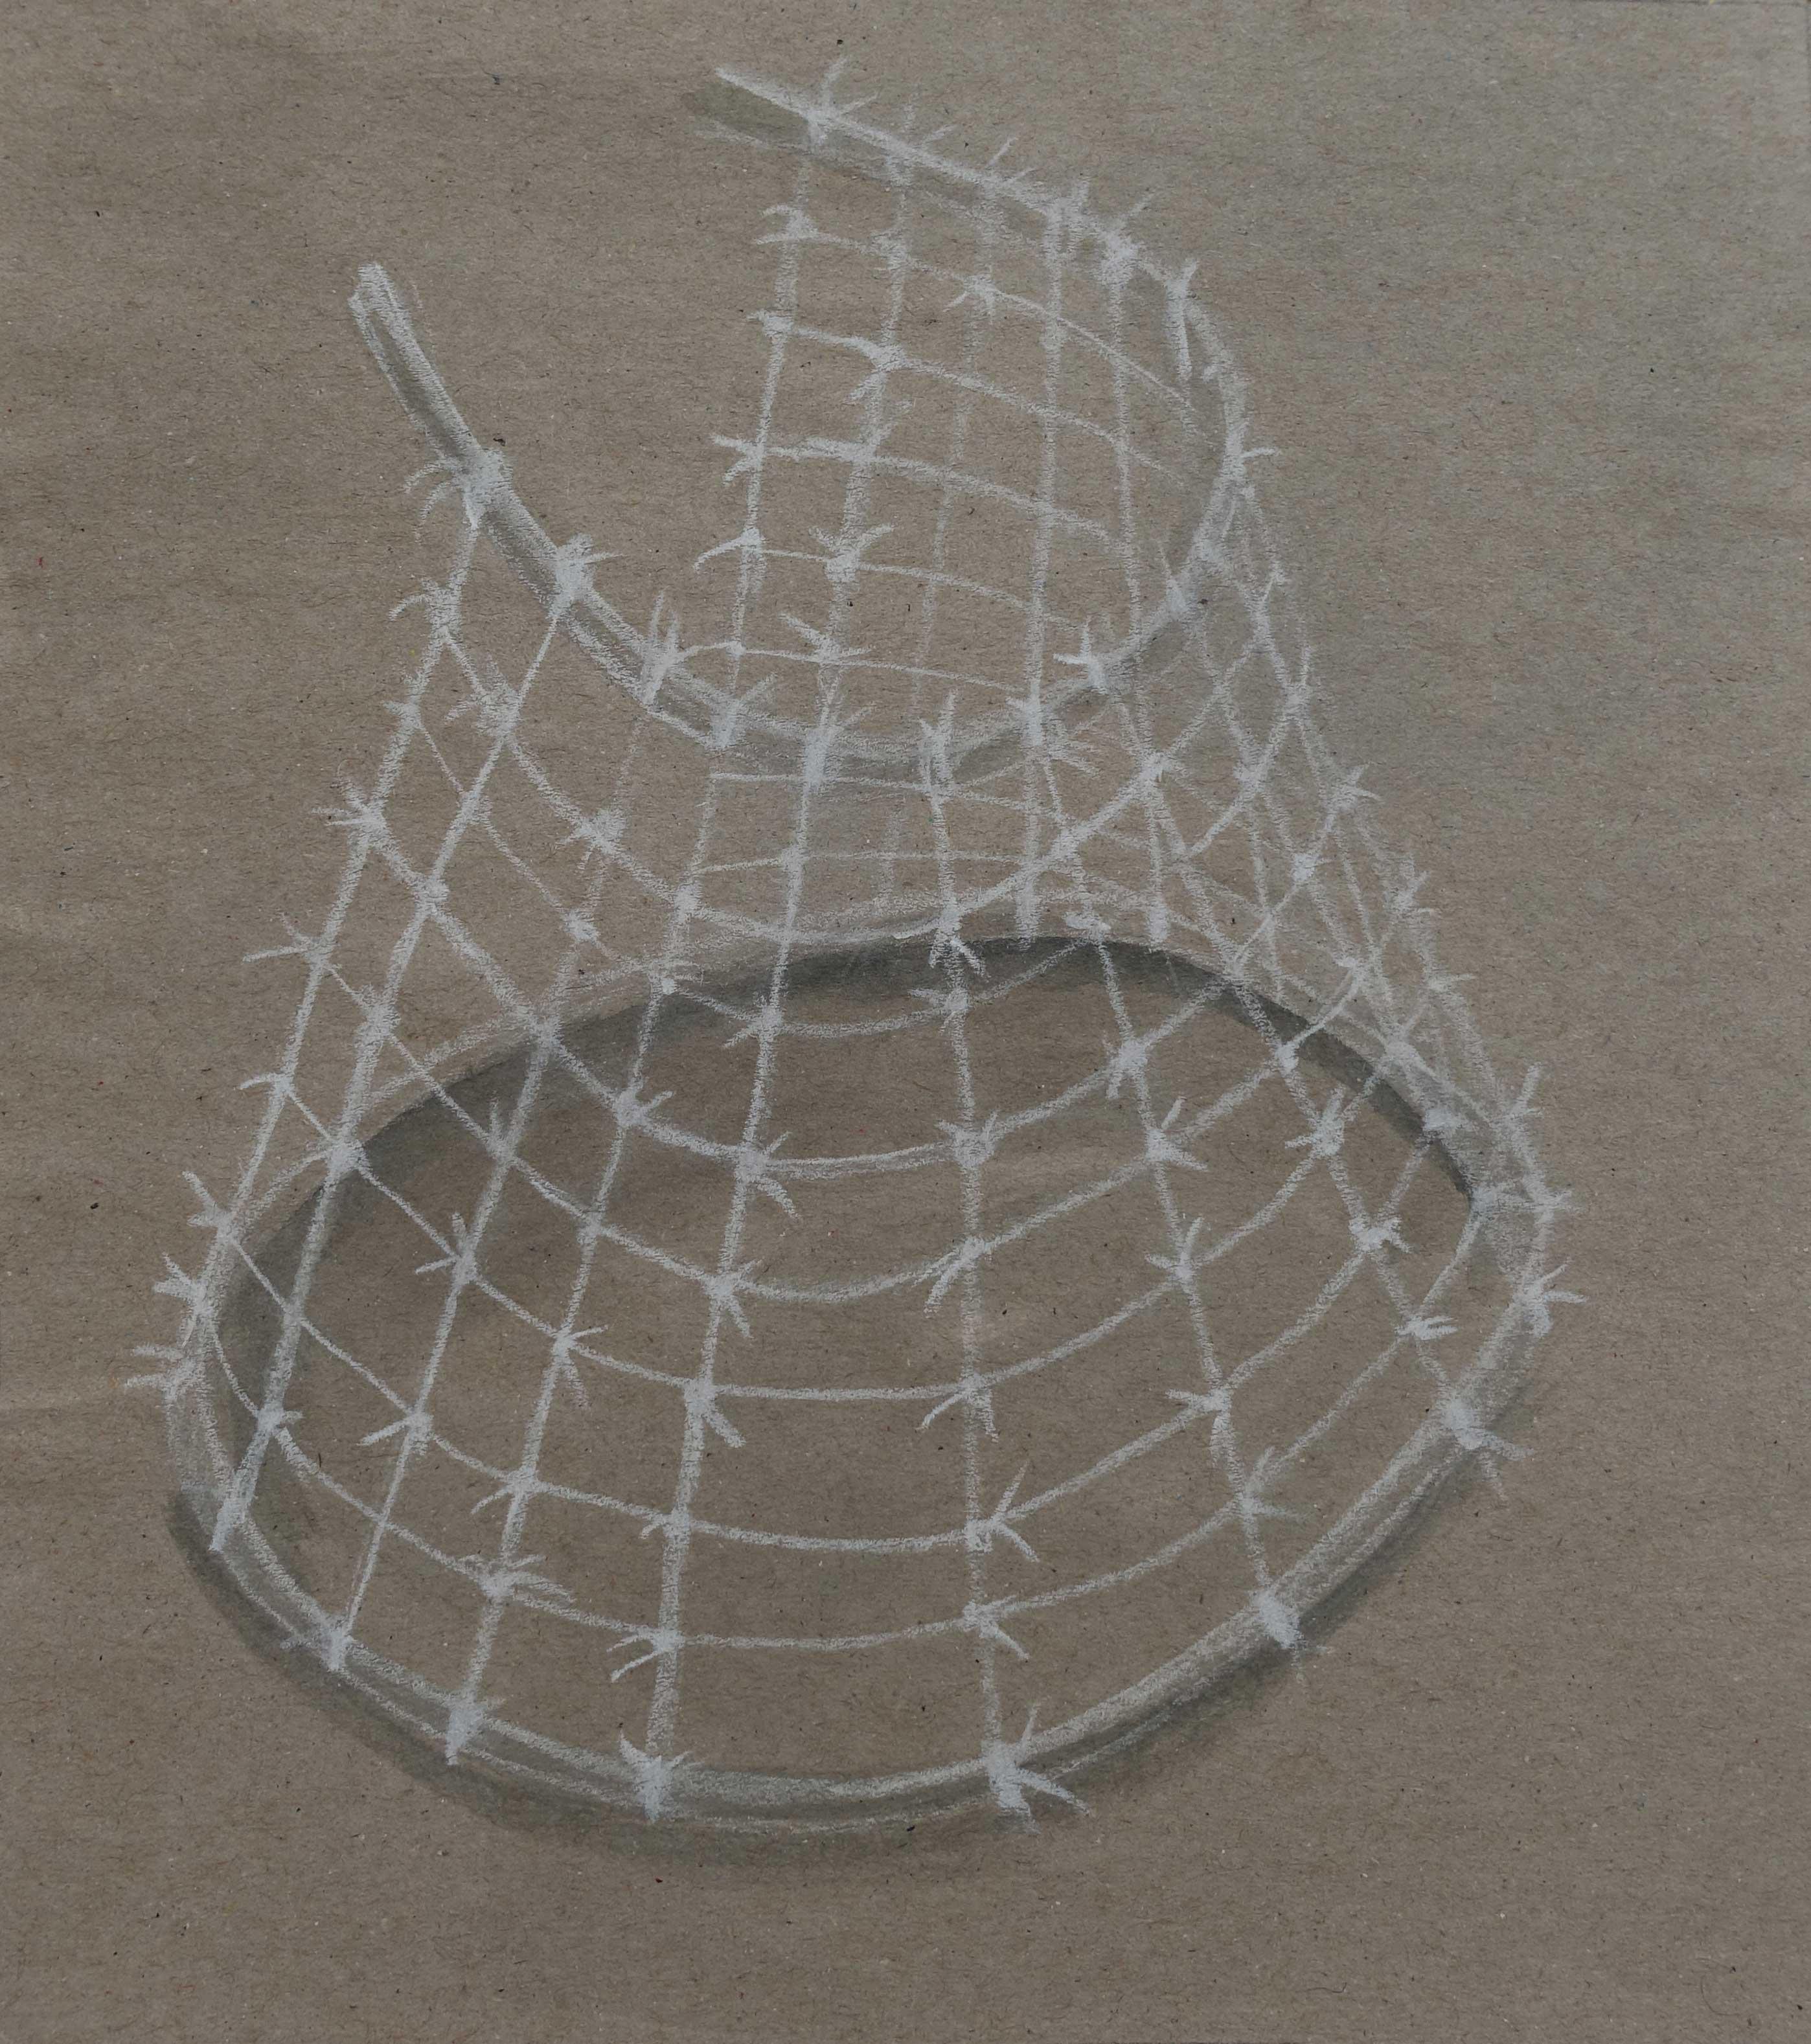 Geidai, 2015, crayon sur papier, 18,5 x 16,5cm